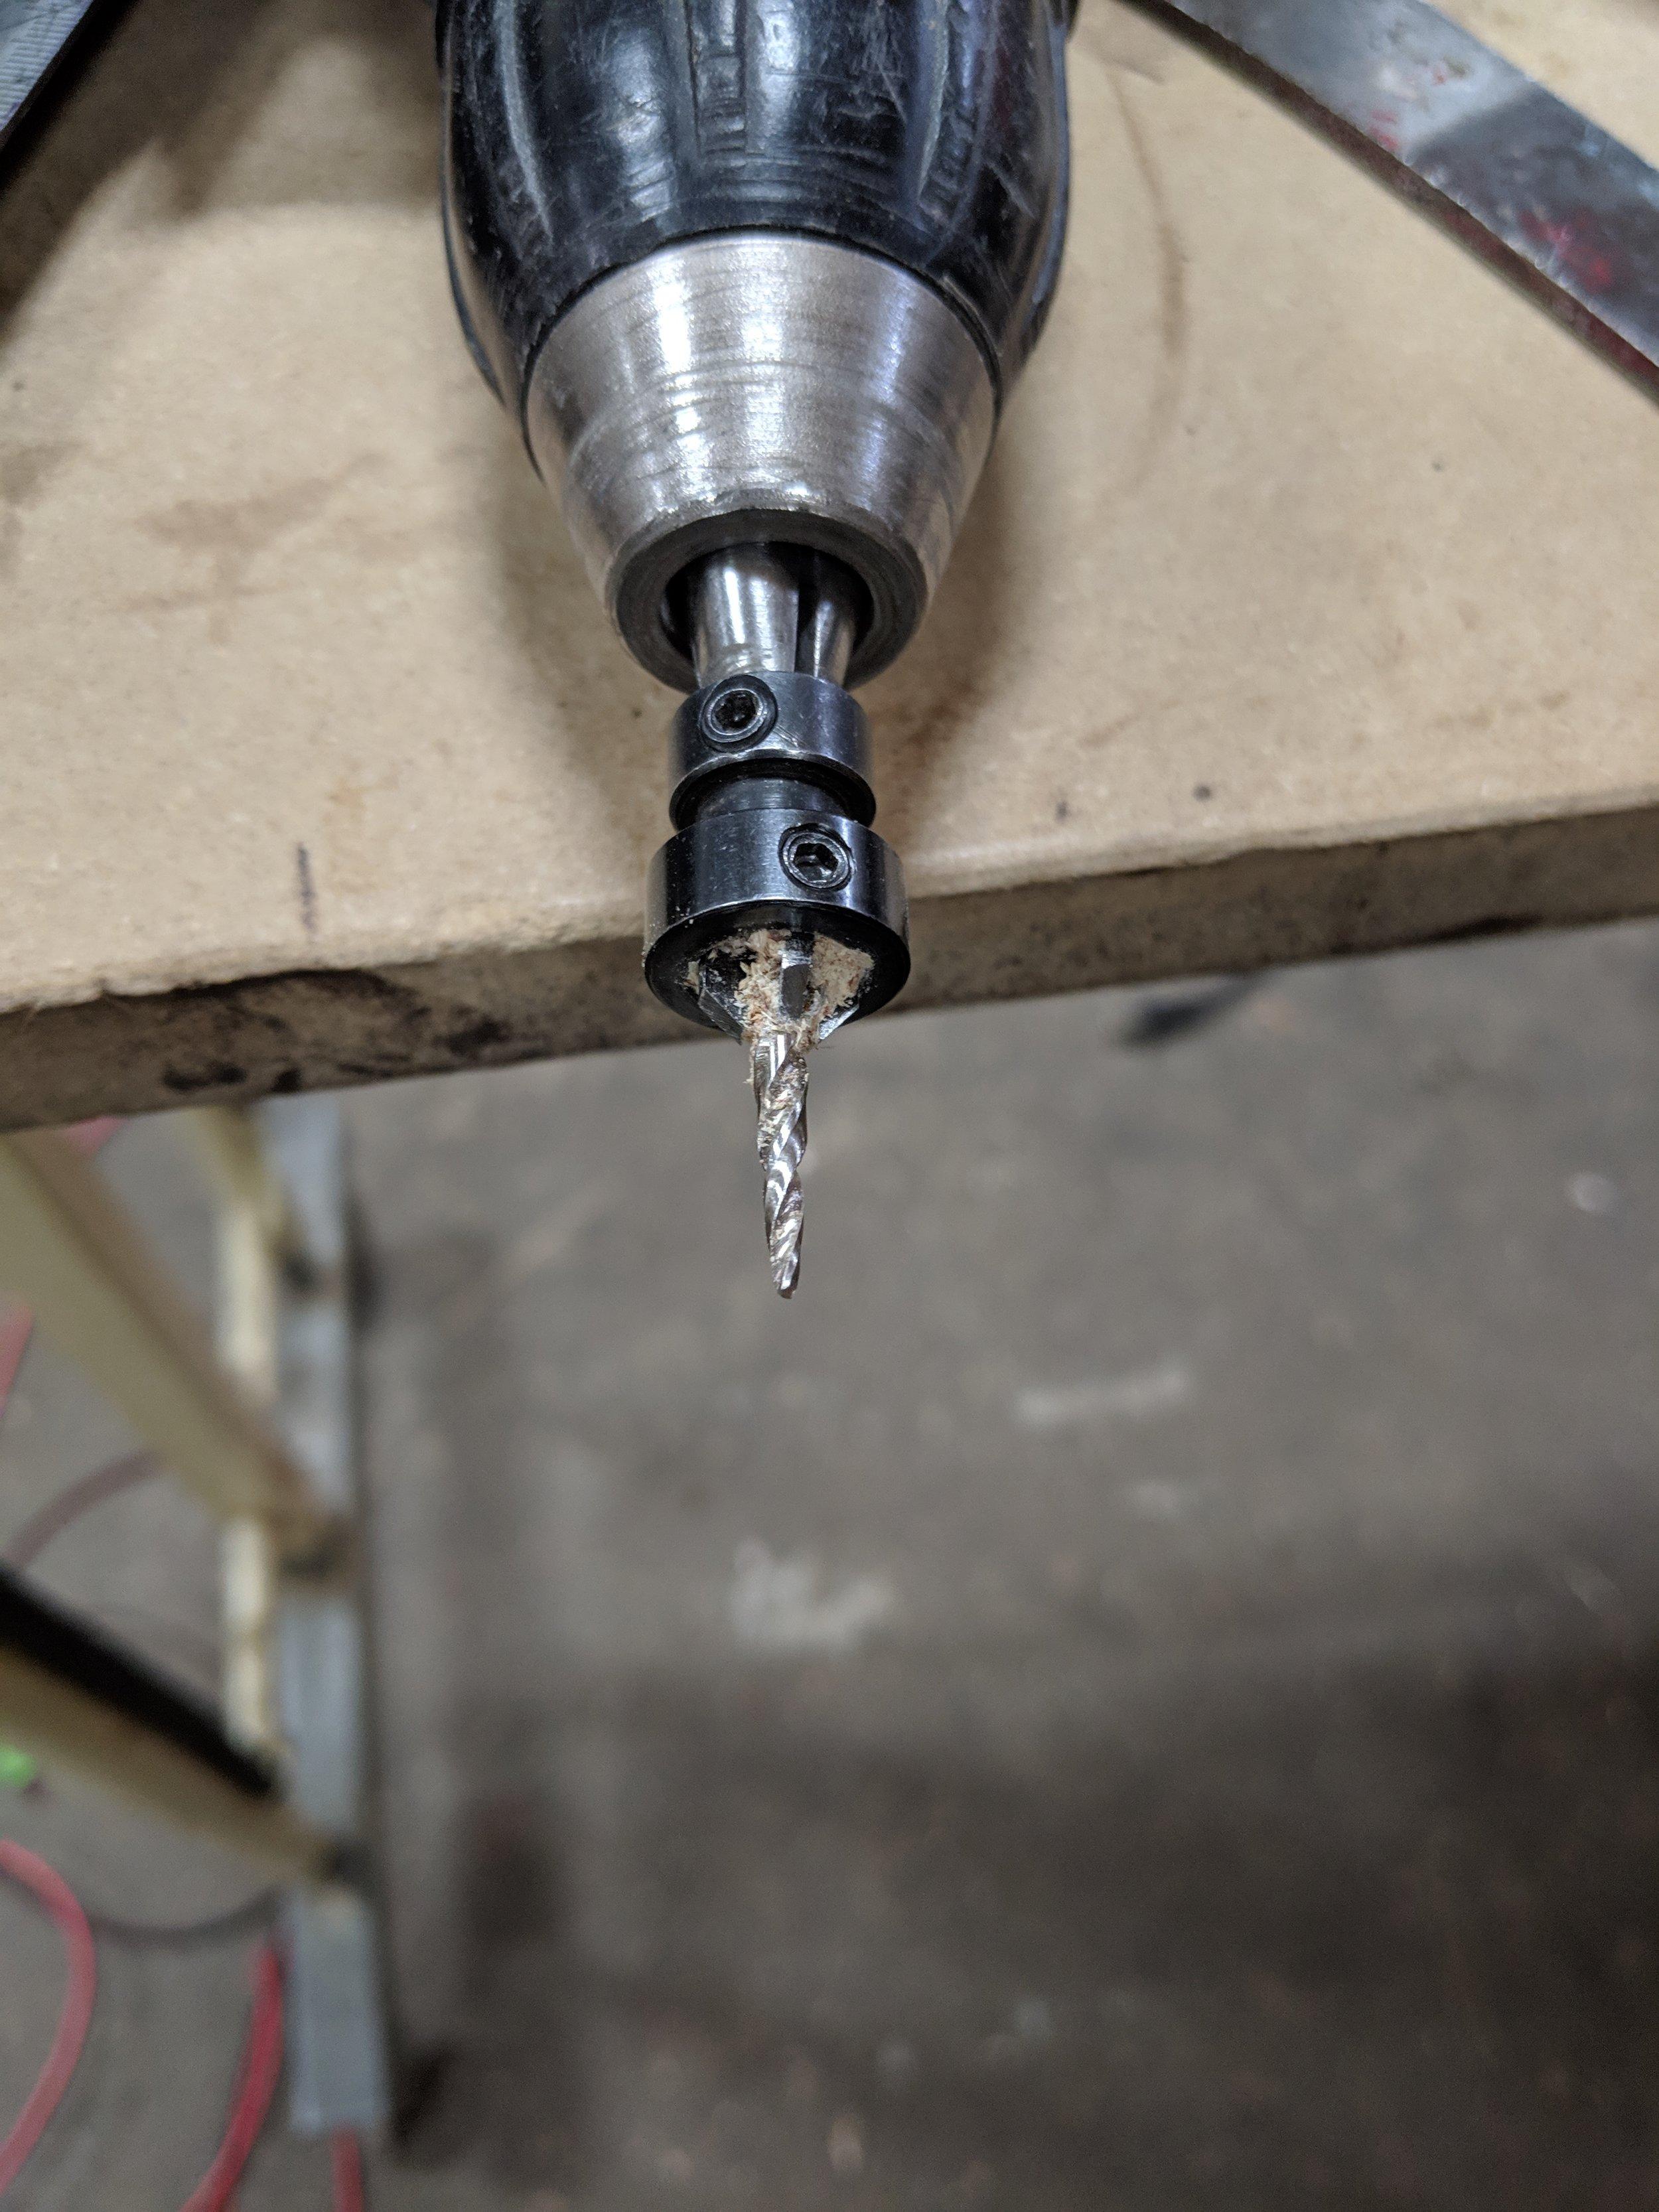 Counter sink drill bit